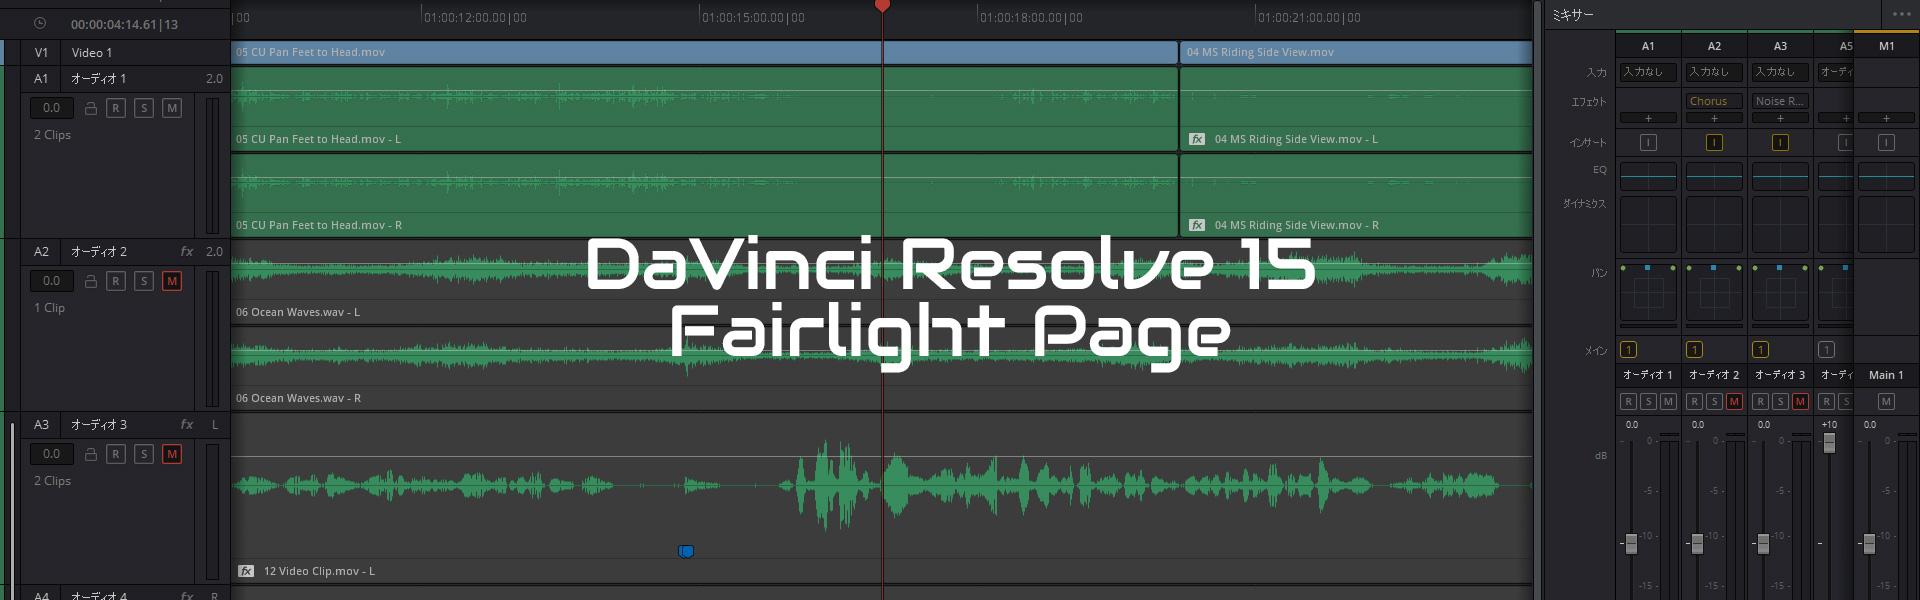 DaVinci Resolve 15 フェアライト ページ